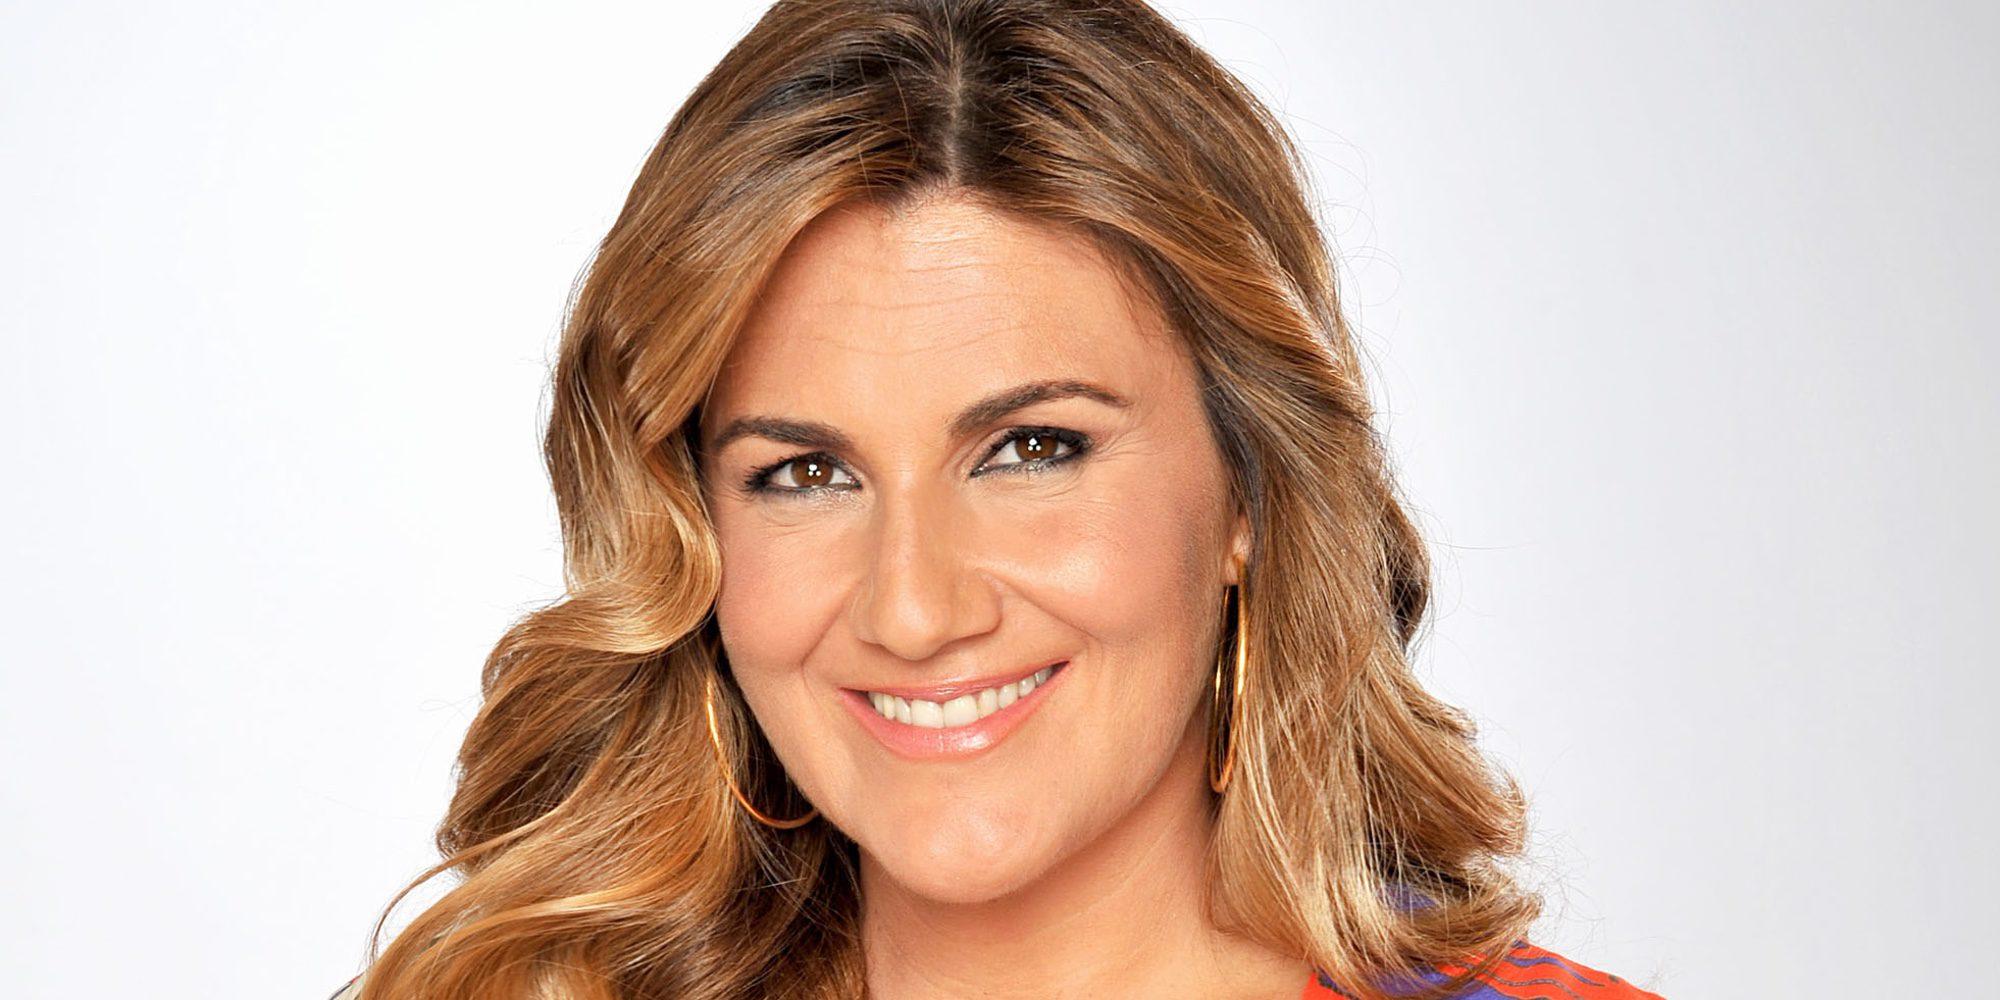 Carlota Corredera sustituirá a Marta Torné como presentadora de 'Cámbiame'